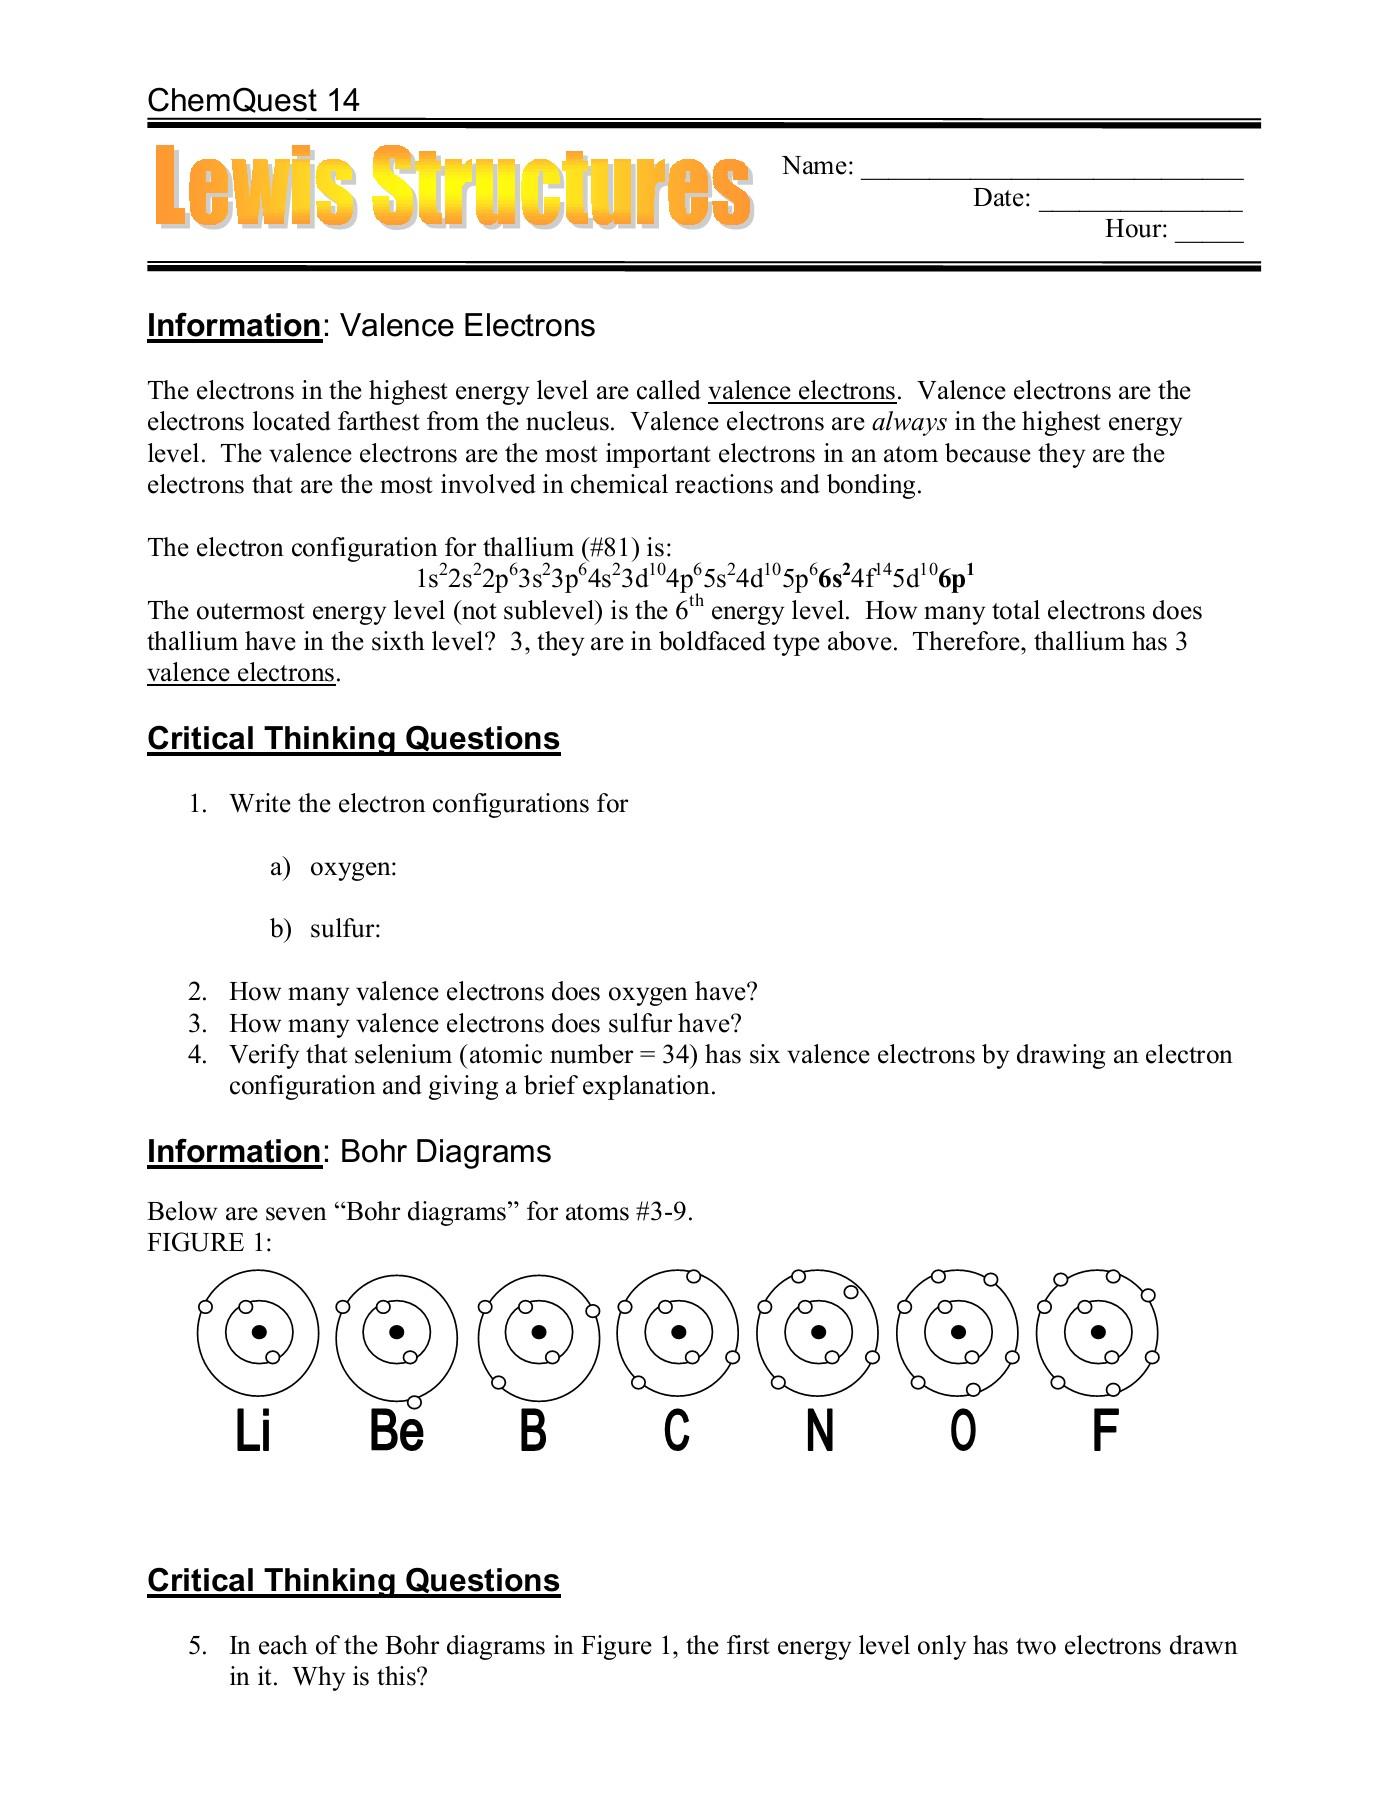 Valence Of Selenium : valence, selenium, Information:, Valence, Electrons, ECoach-Flip, EBook, Pages, AnyFlip